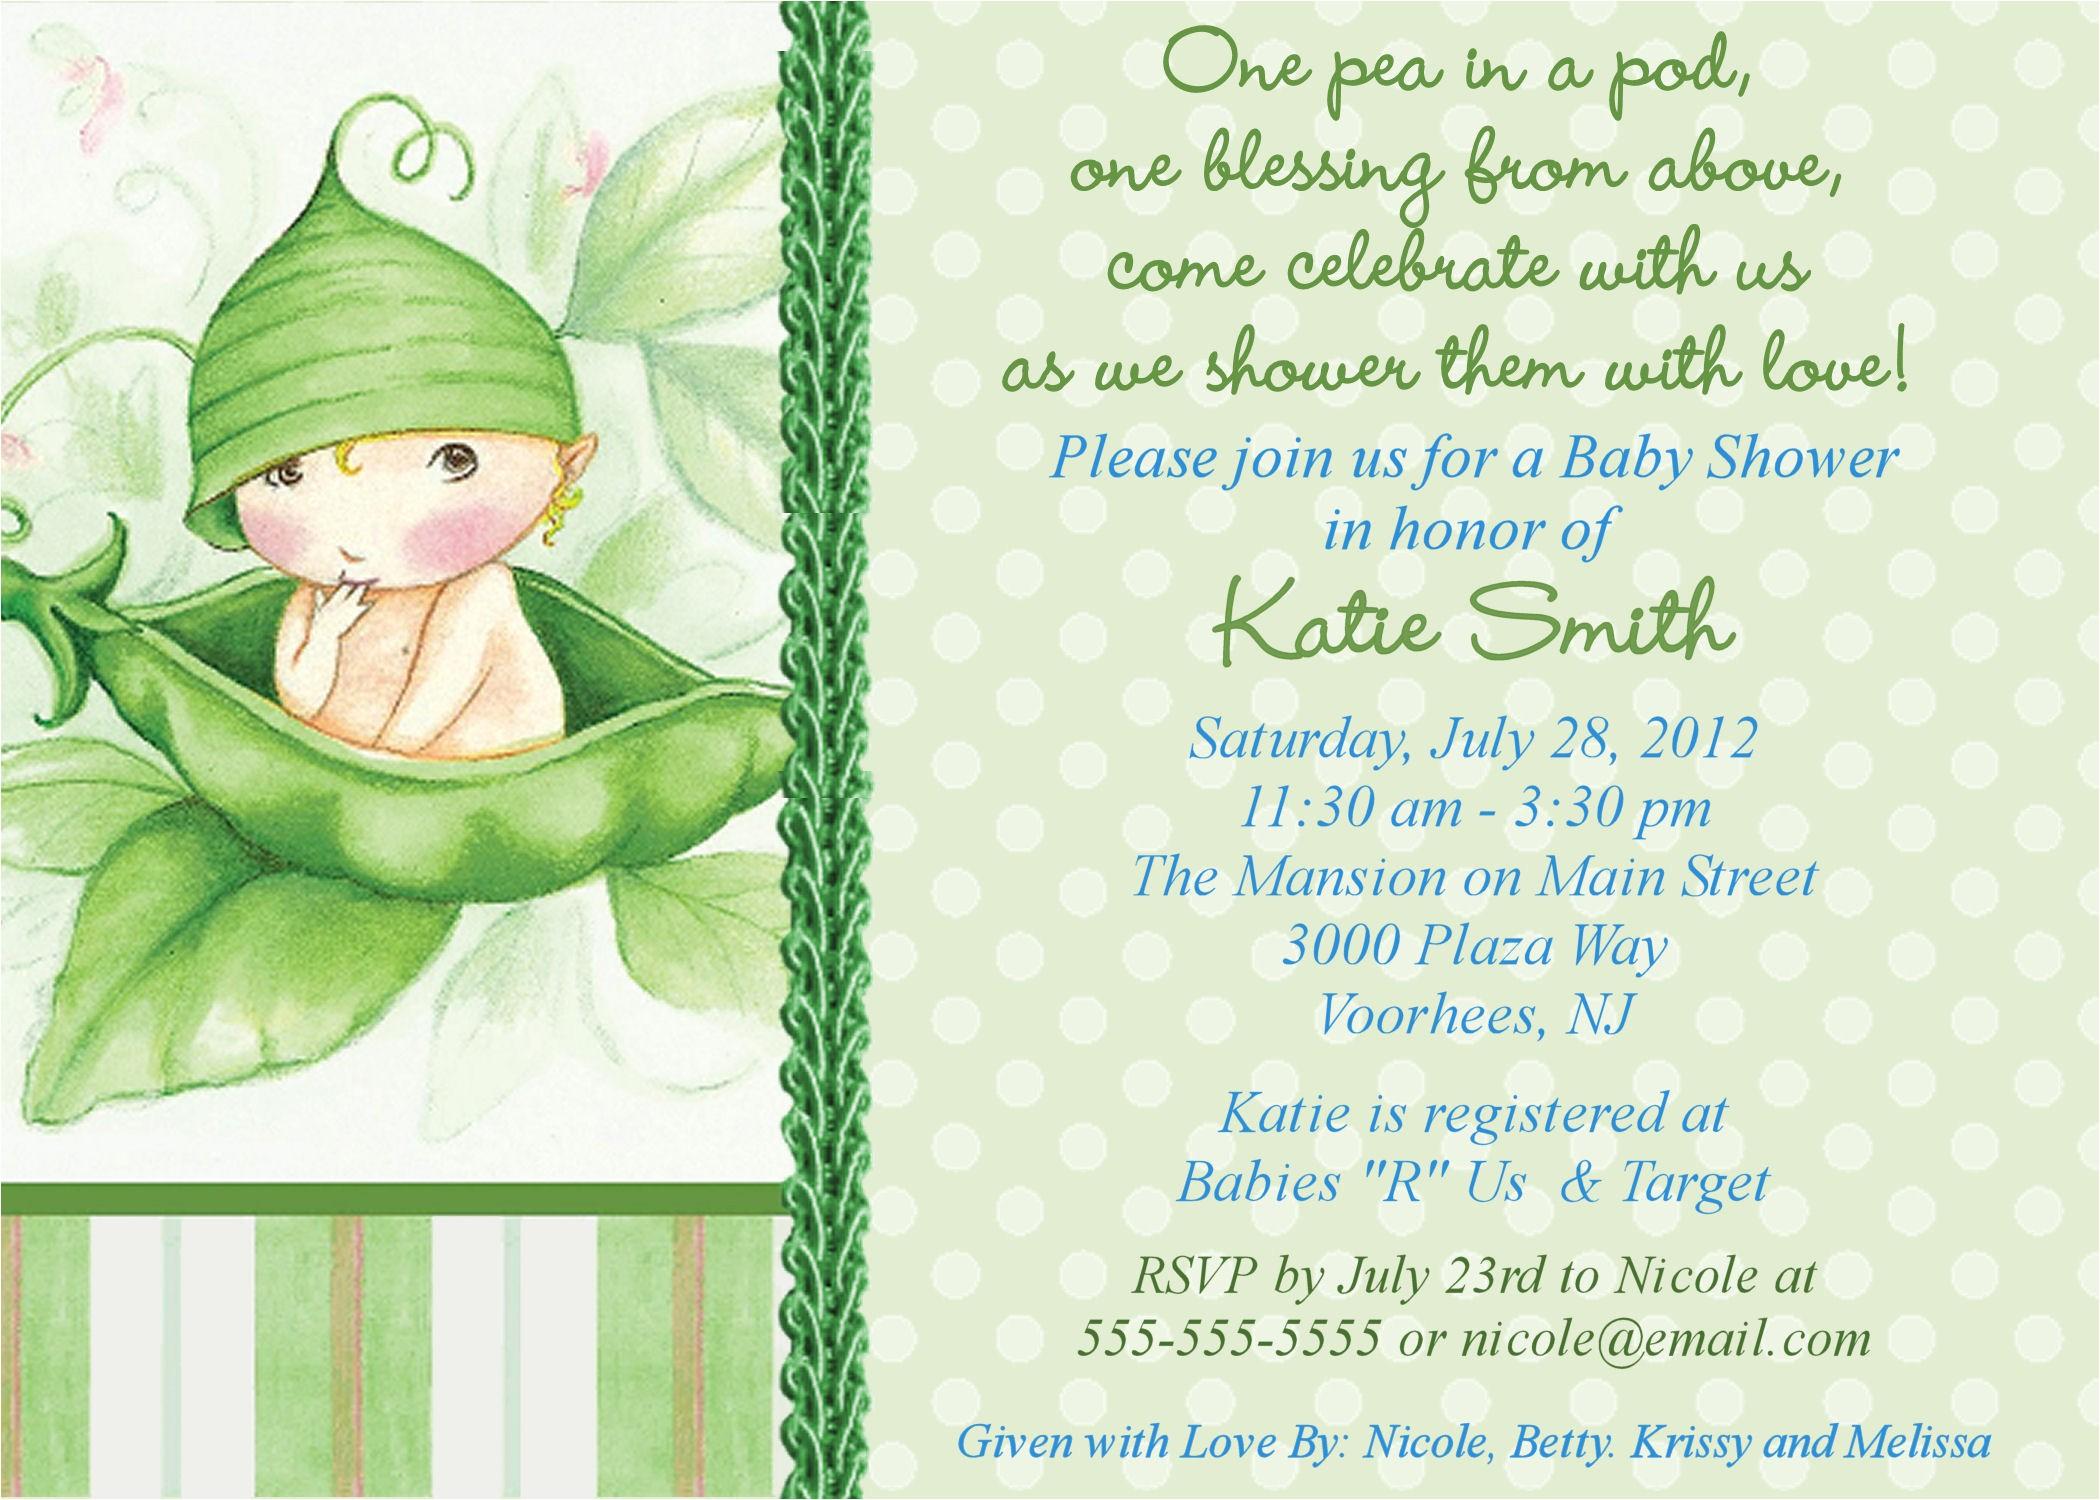 baby shower invitation sample